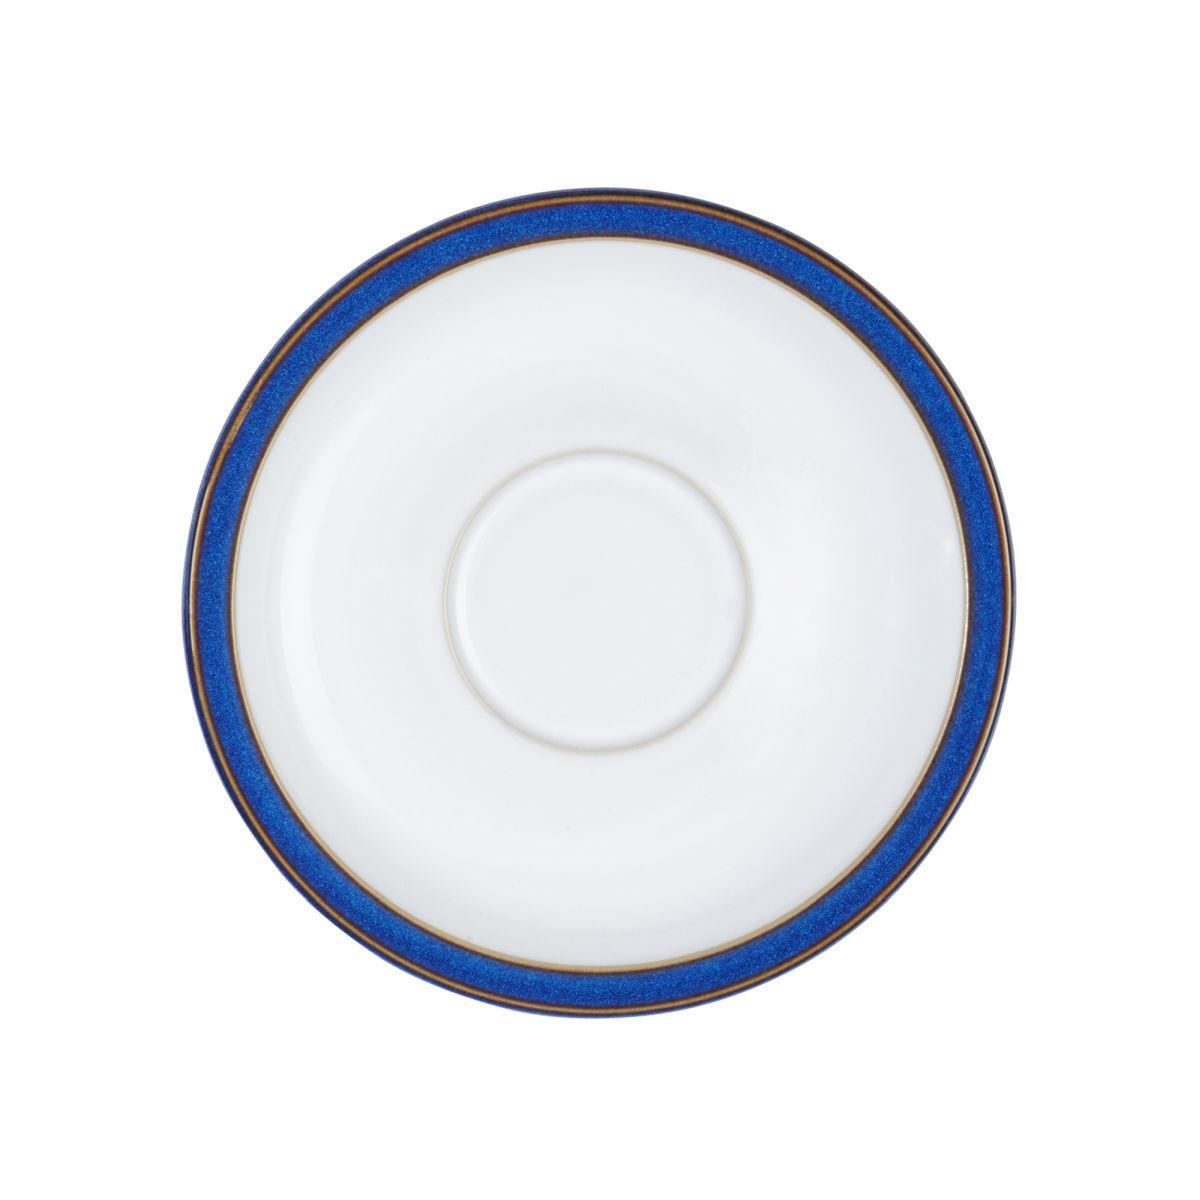 101498549: Imperial Blue Tea Saucer